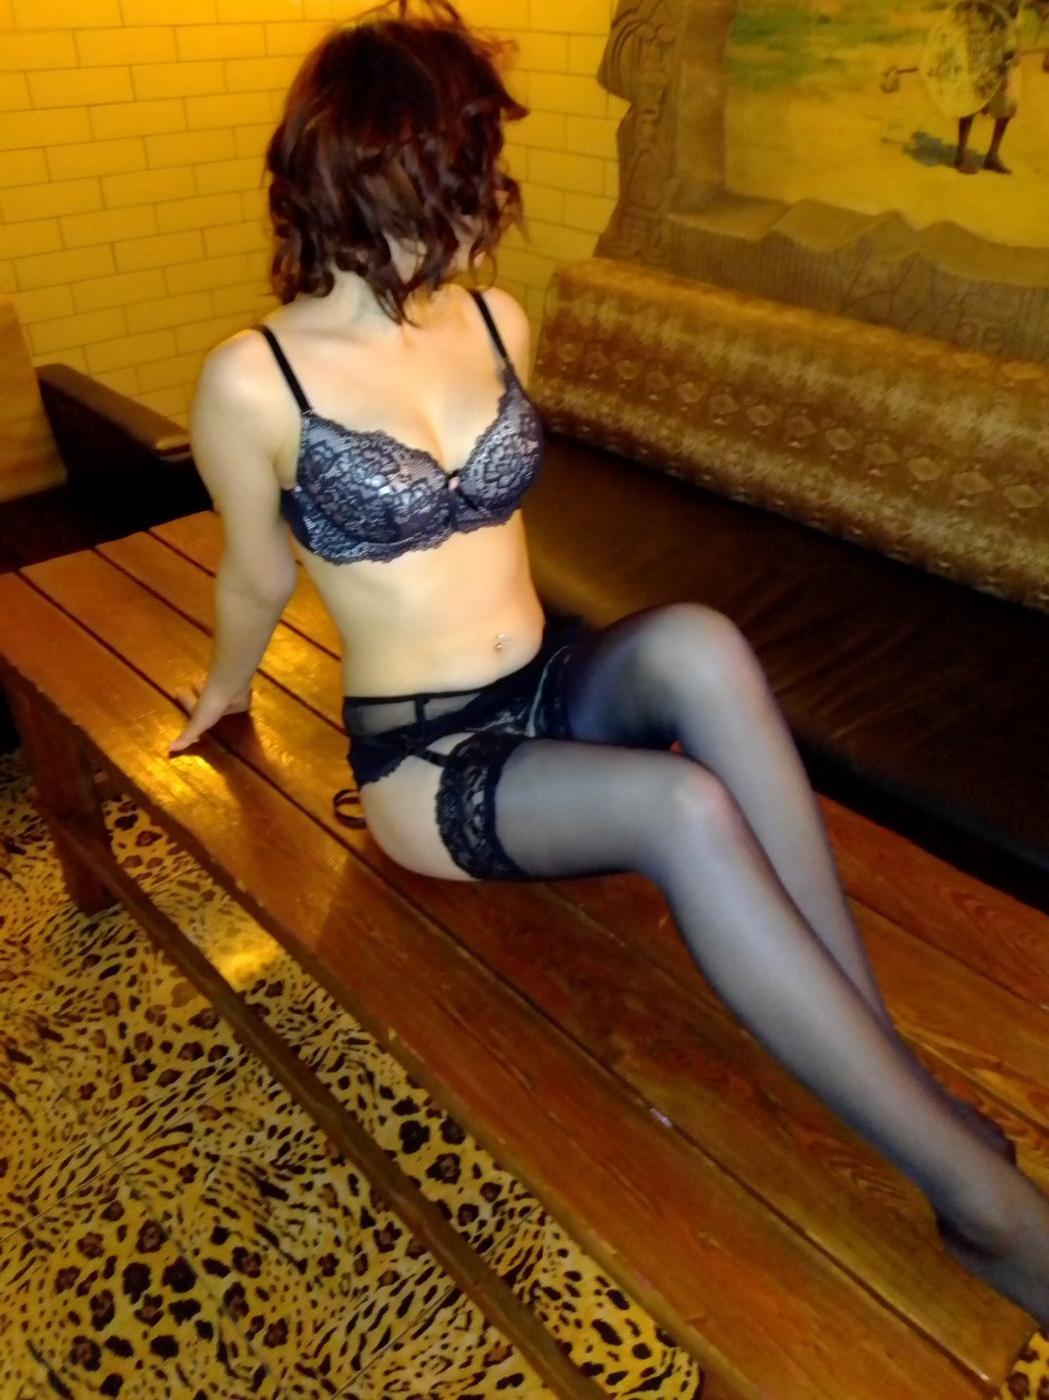 Проститутка Ксюша Нина, 31 год, метро Братиславская